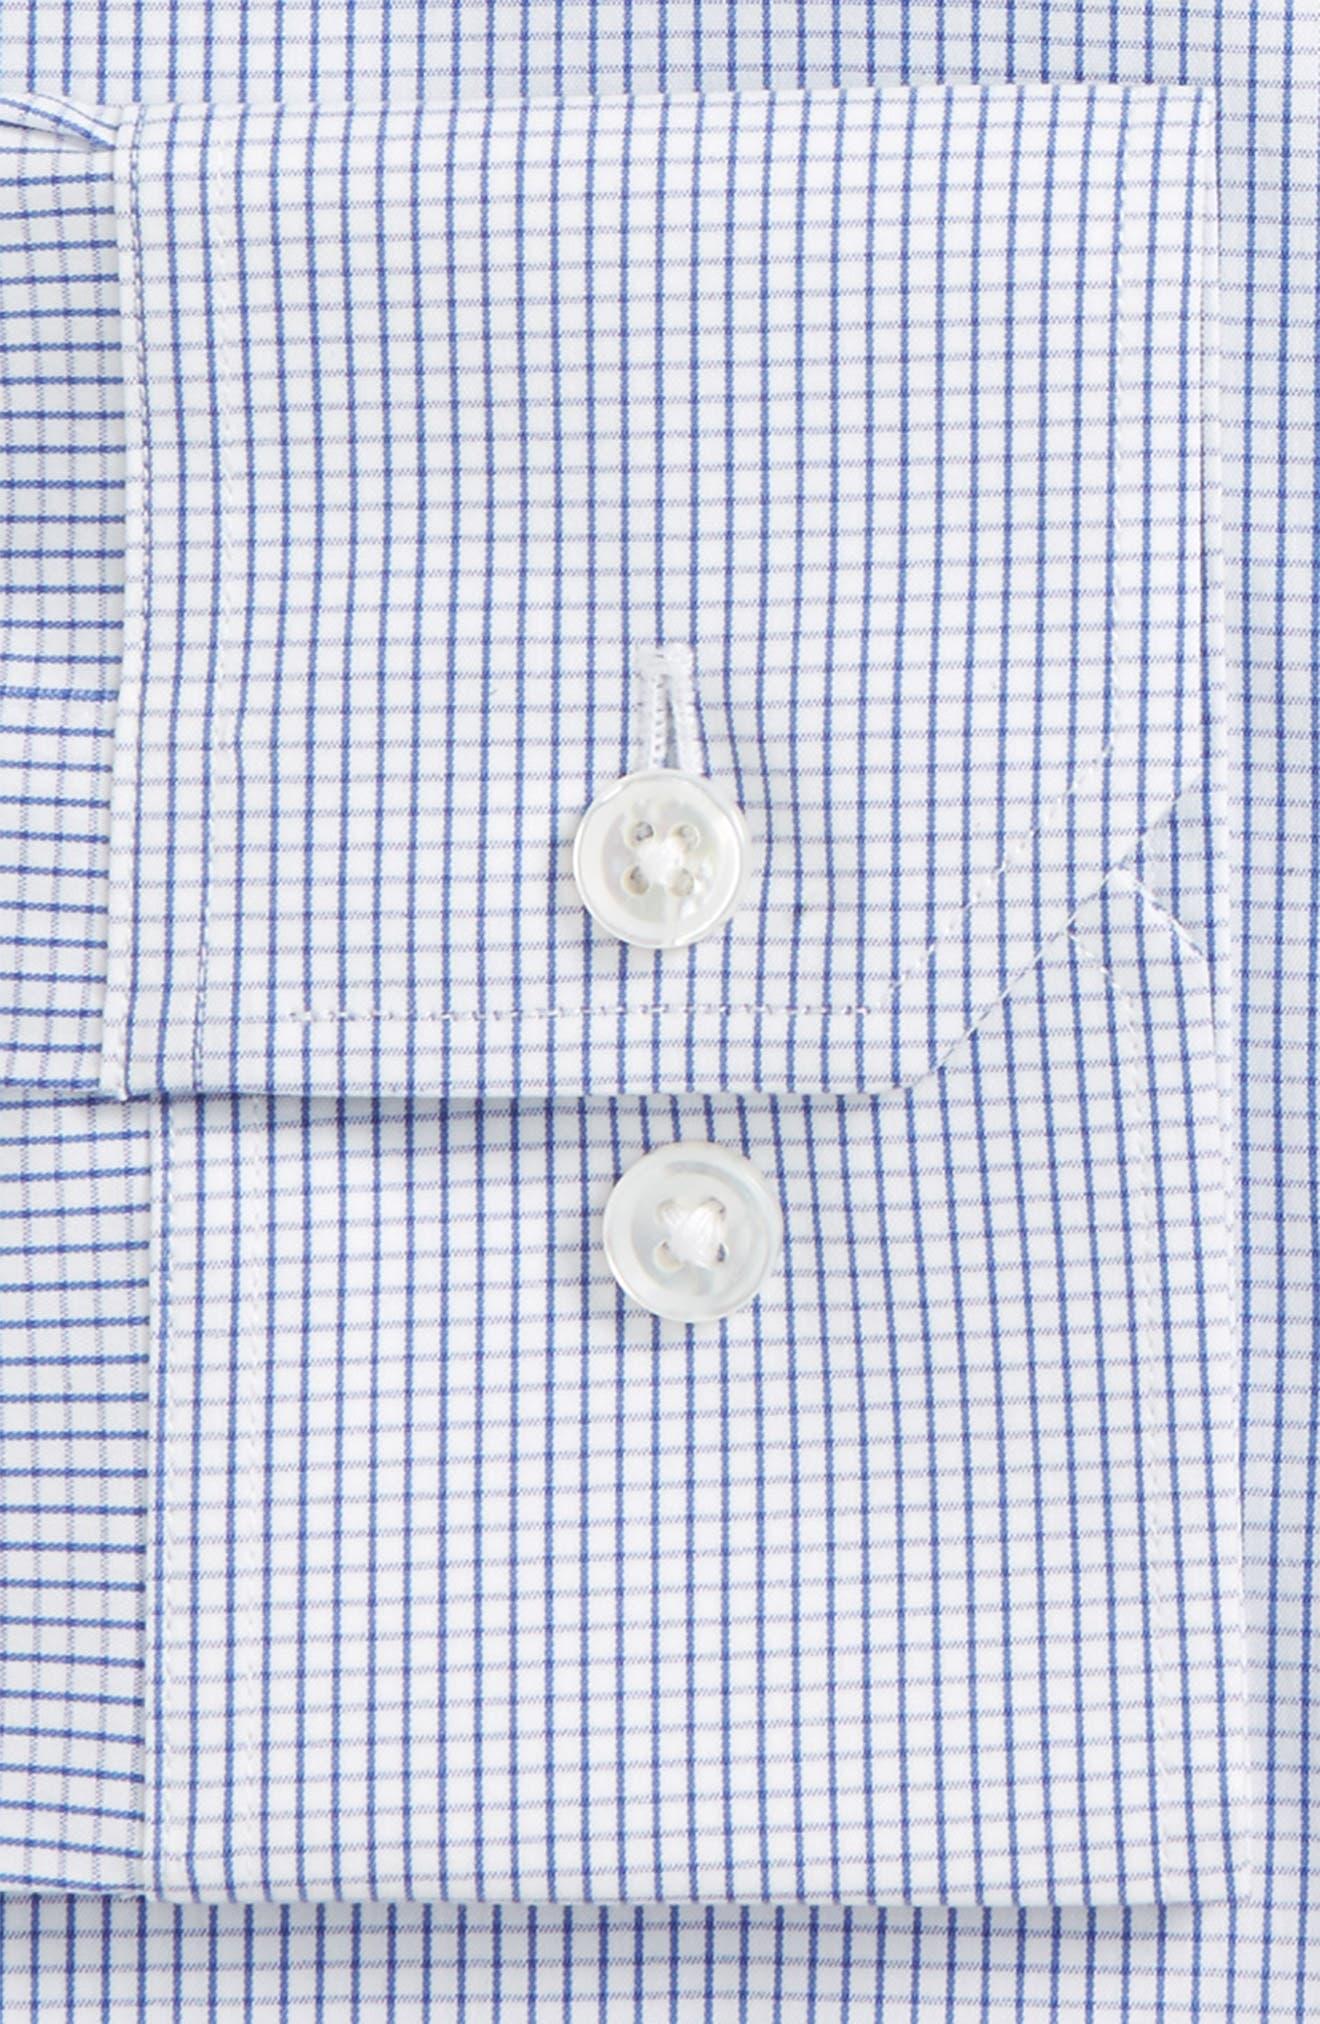 Jetsetter Slim Fit Stretch Check Dress Shirt,                             Alternate thumbnail 6, color,                             NAVY MINI CHECK